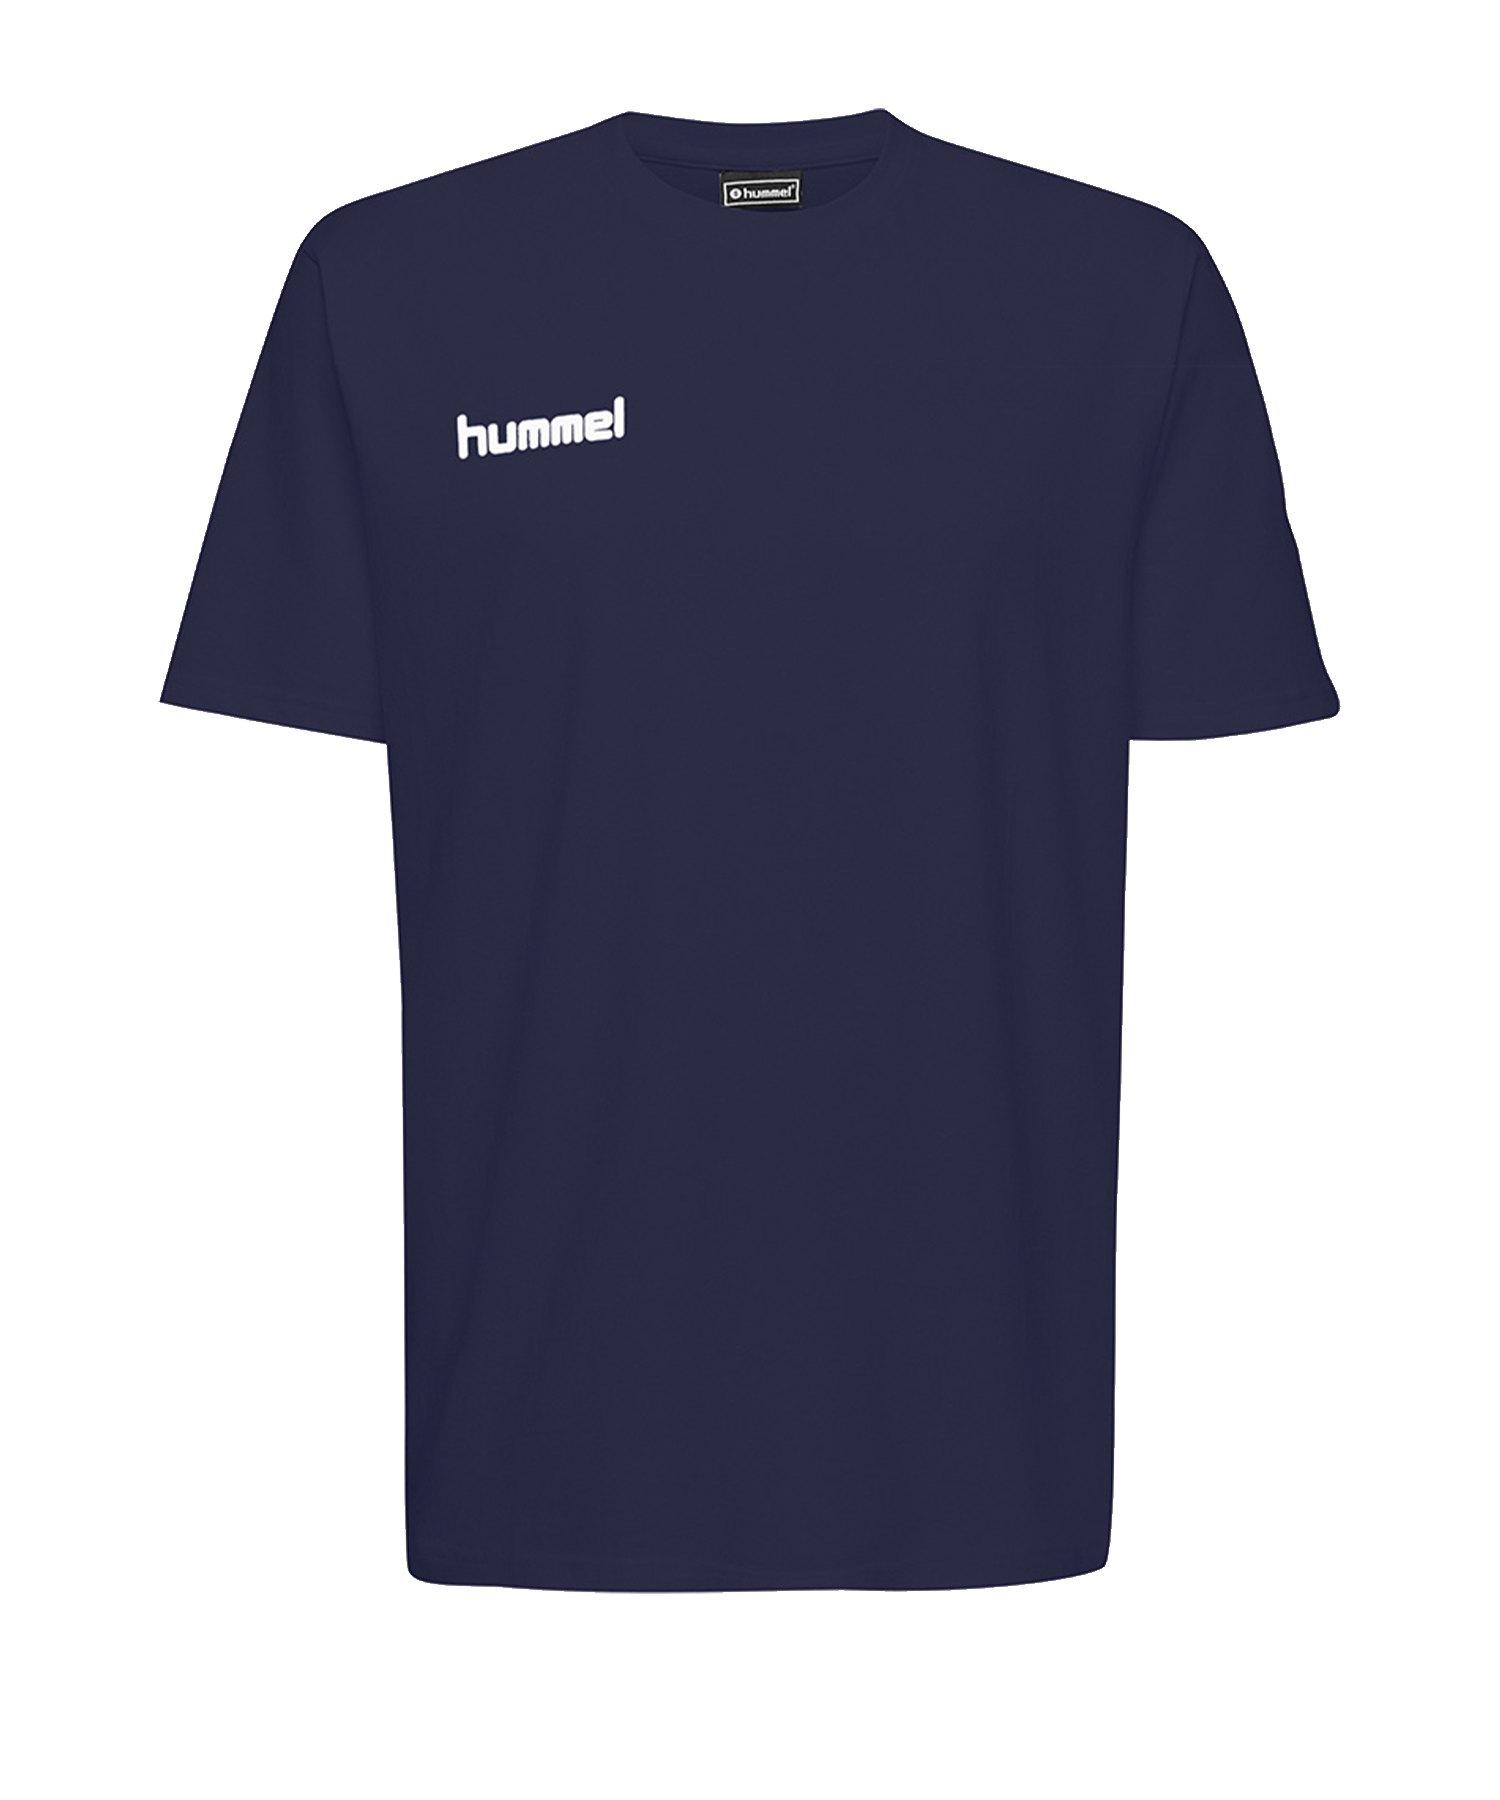 Hummel Cotton T-Shirt Blau F7026 - Blau